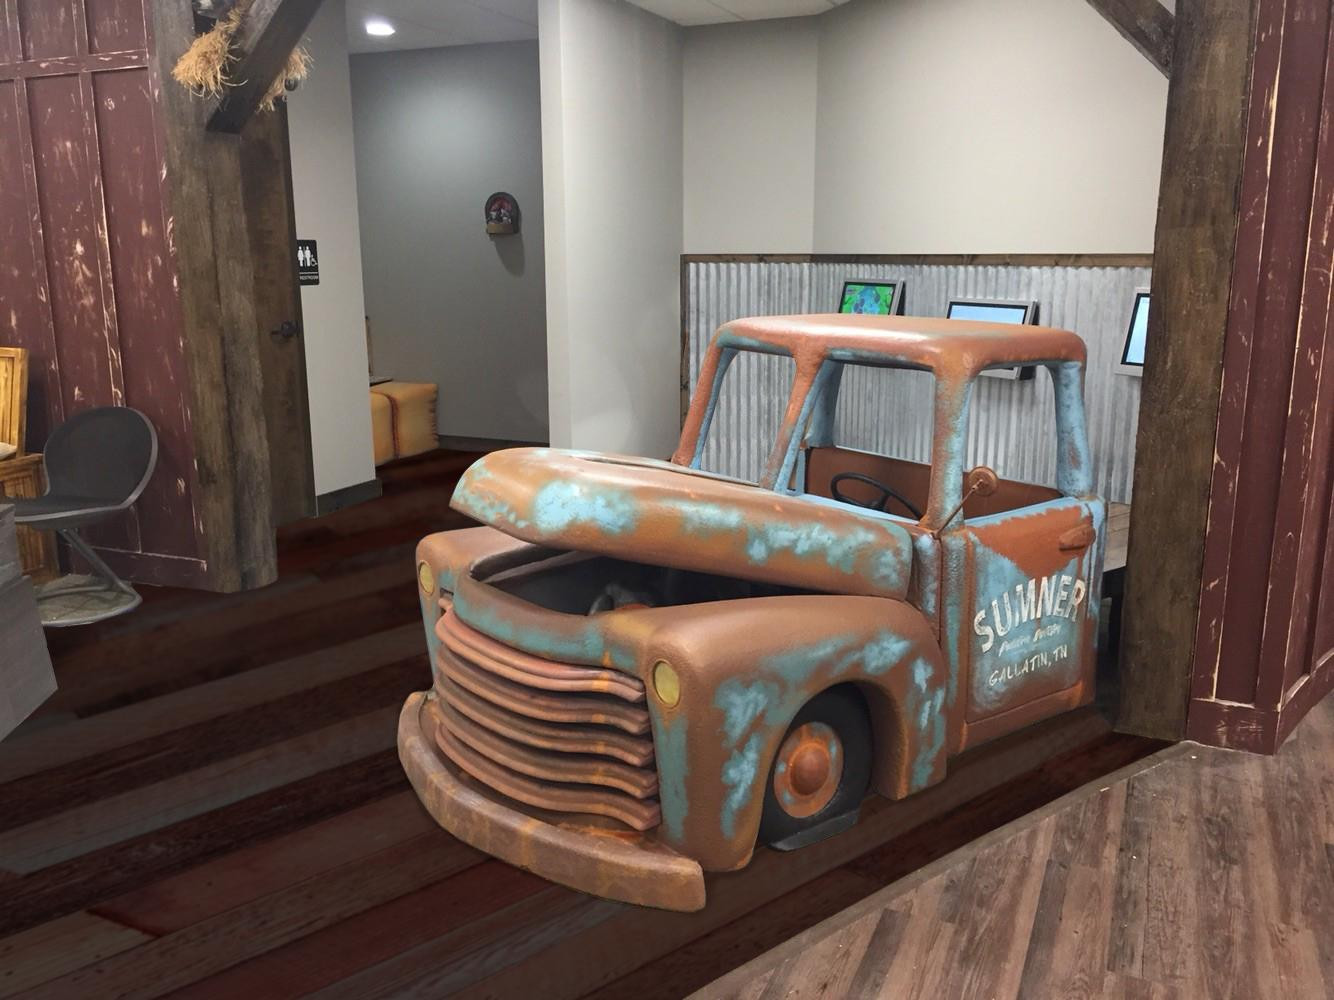 Rusty truck in lobby with barnyard theme